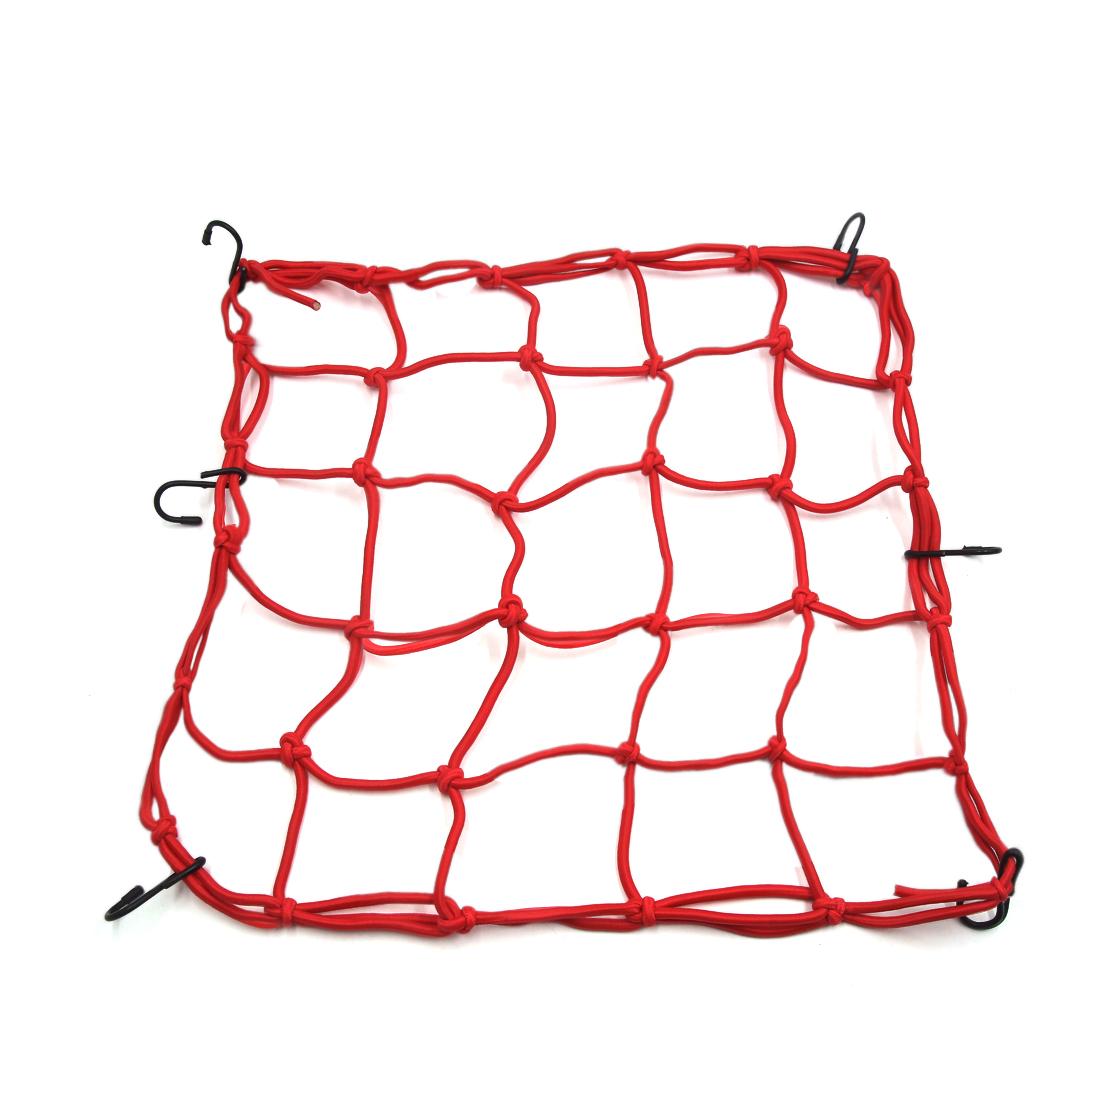 40 x 40cm Motorcycle Luggage Fuel Cargo Net Mesh Web Storage Holder Red